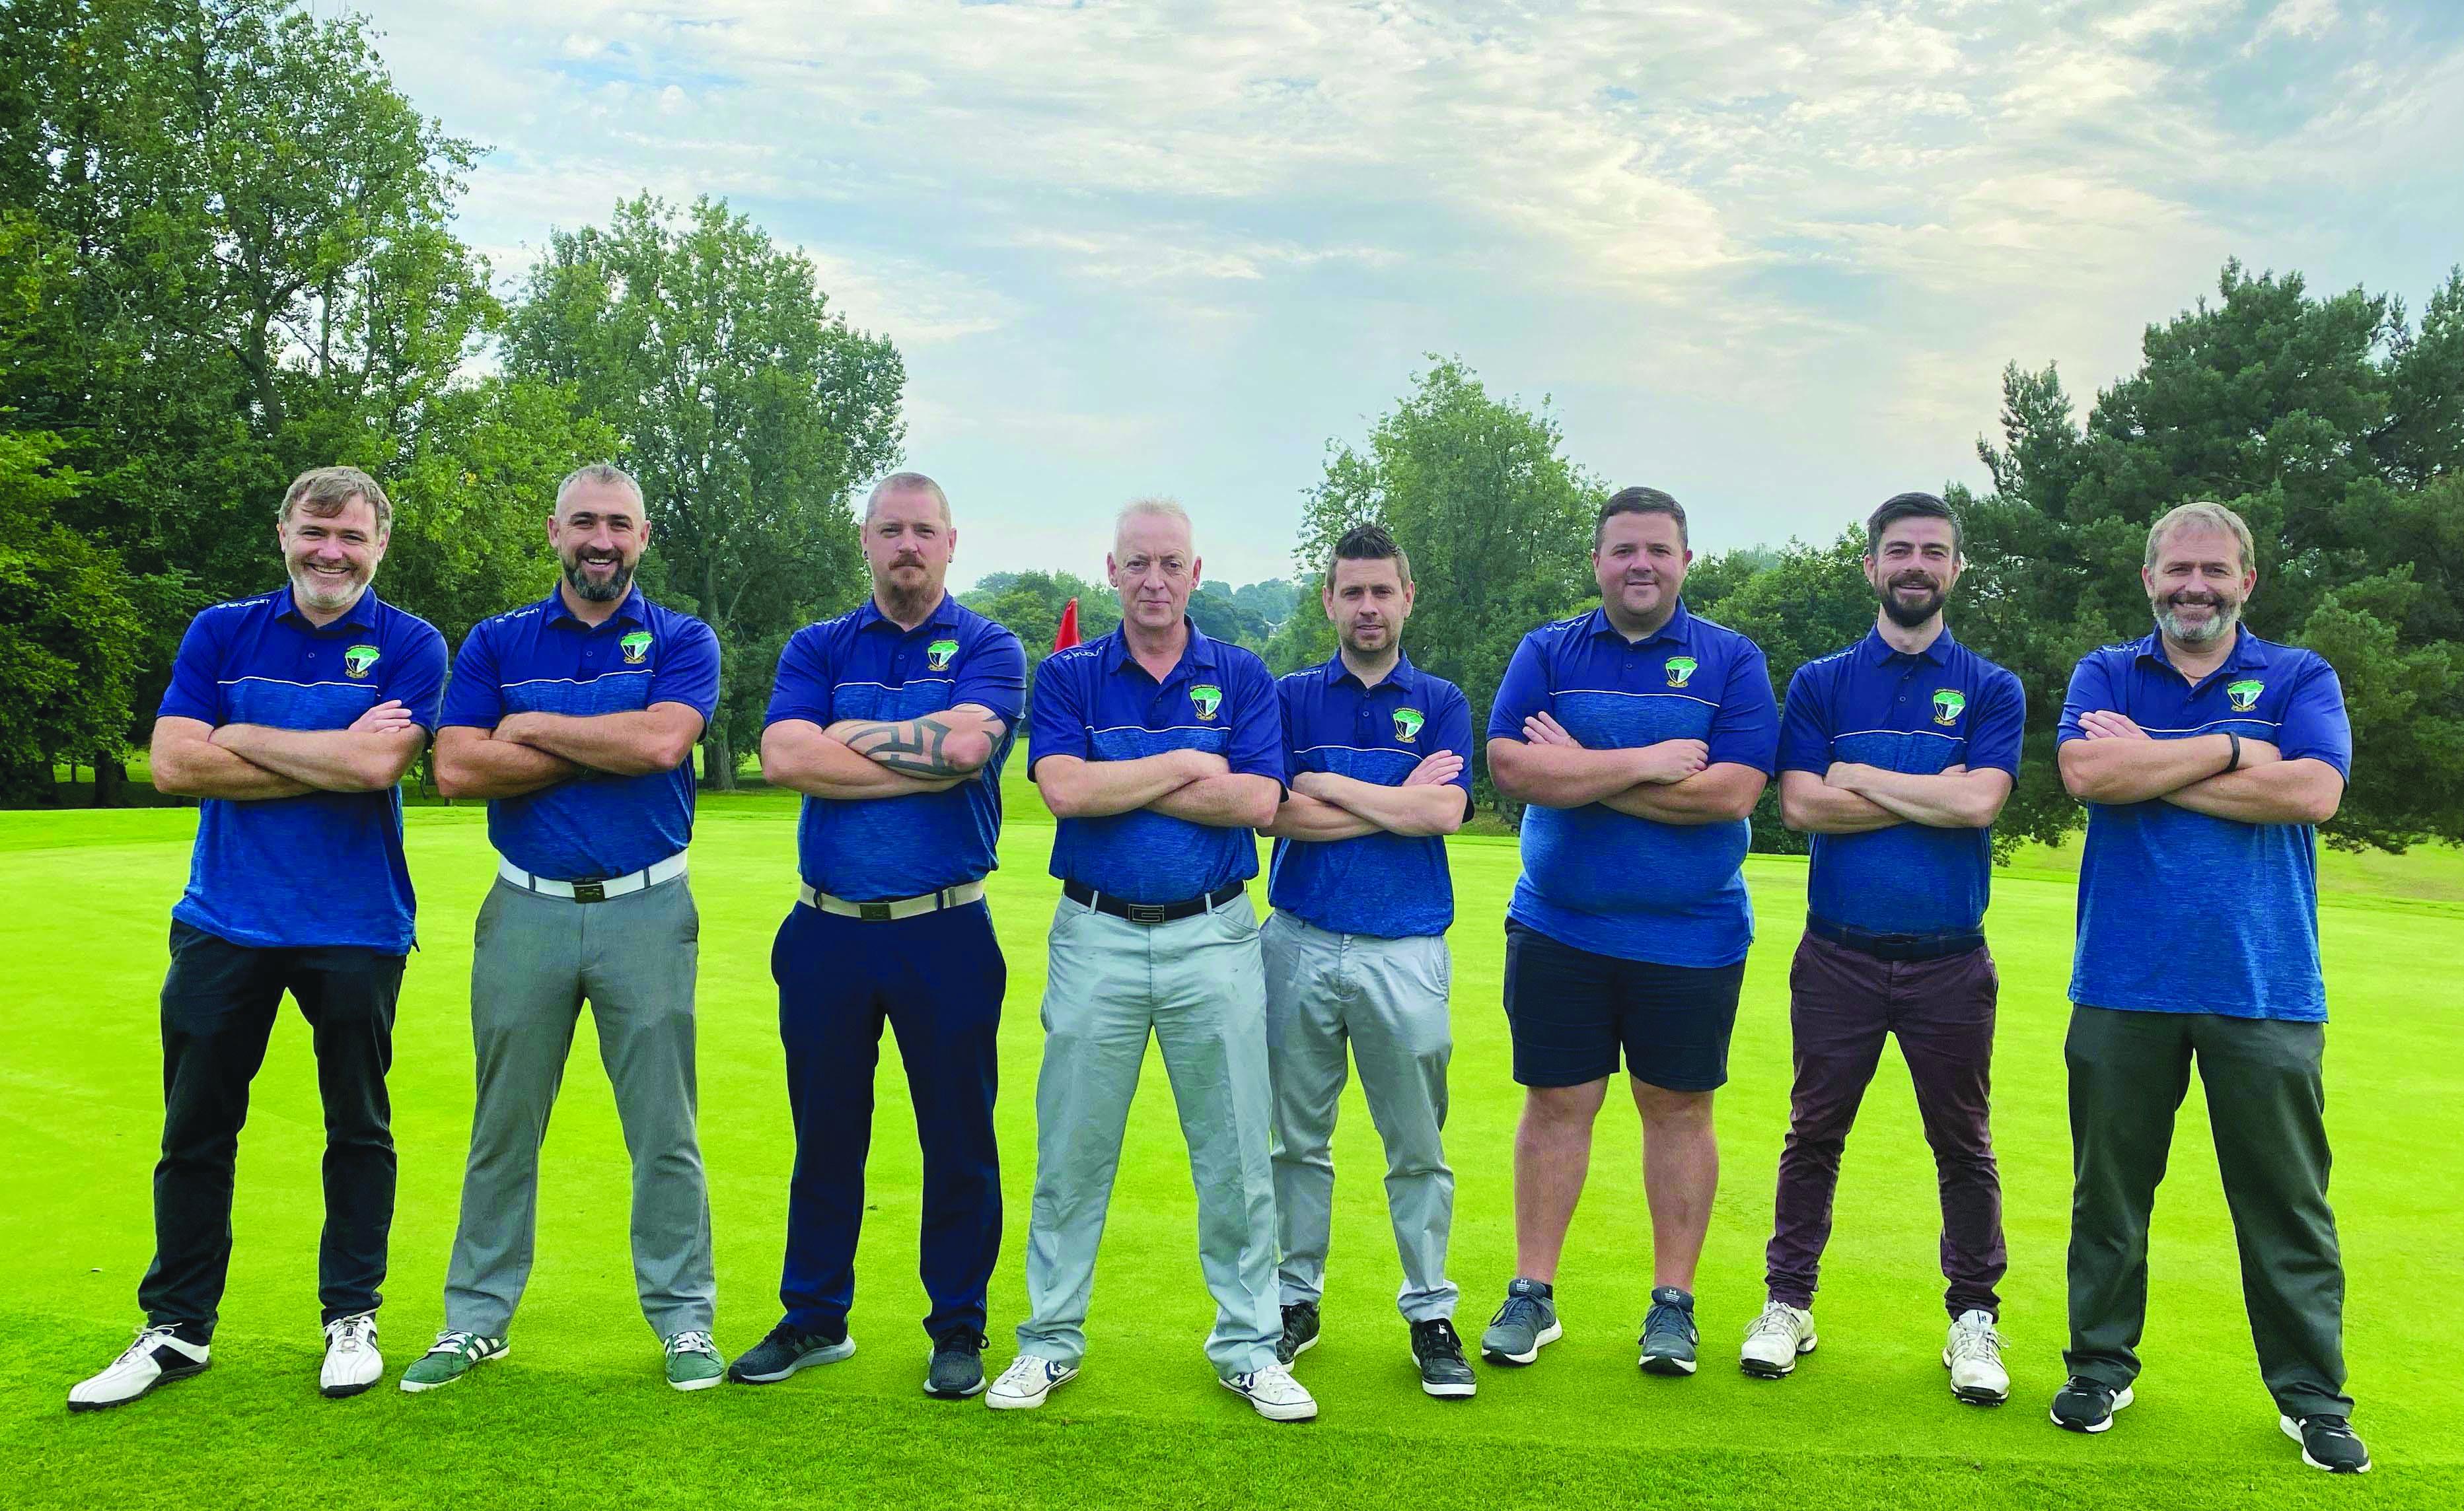 The Colin Valley team, L-R: Gerard Garland, Brian Conlon, Paul McAuley, Hugh McComb, Paul Hyland, Ciaran O'Connor, Kevin Scott and Stephen Garland.